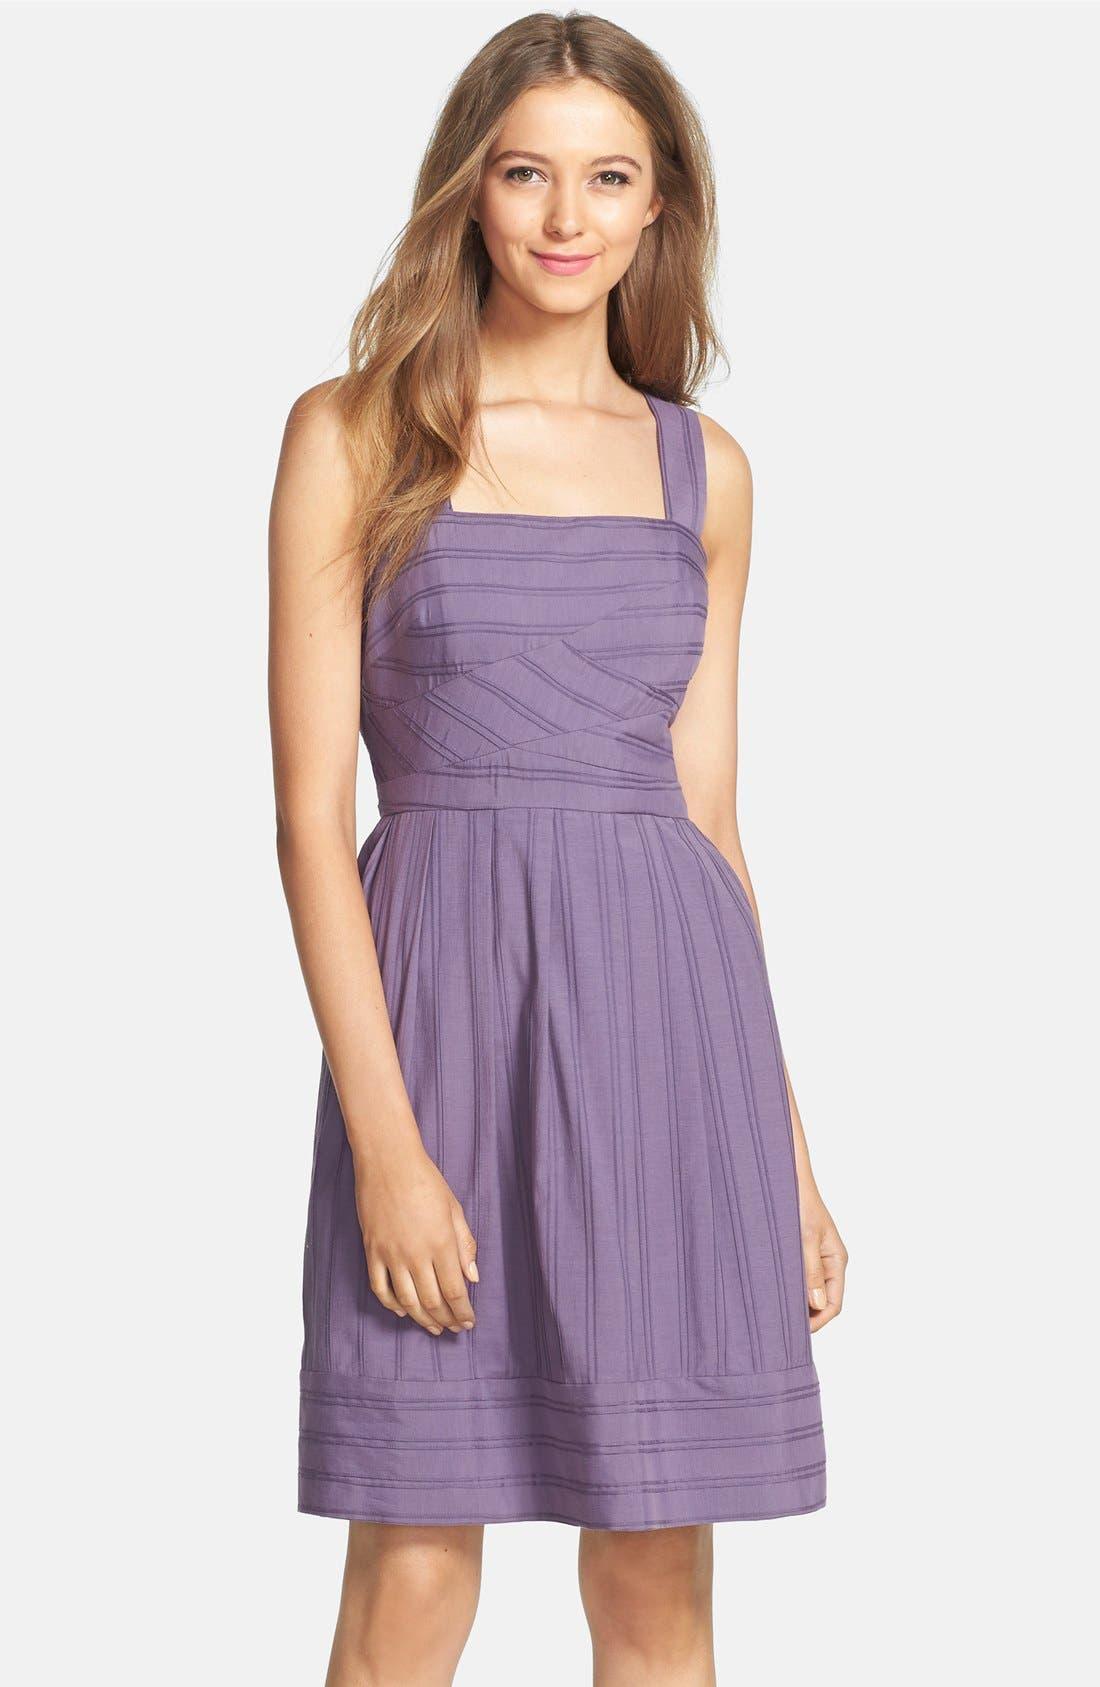 Main Image - Ivy & Blu Pintuck Fit & Flare Tank Dress